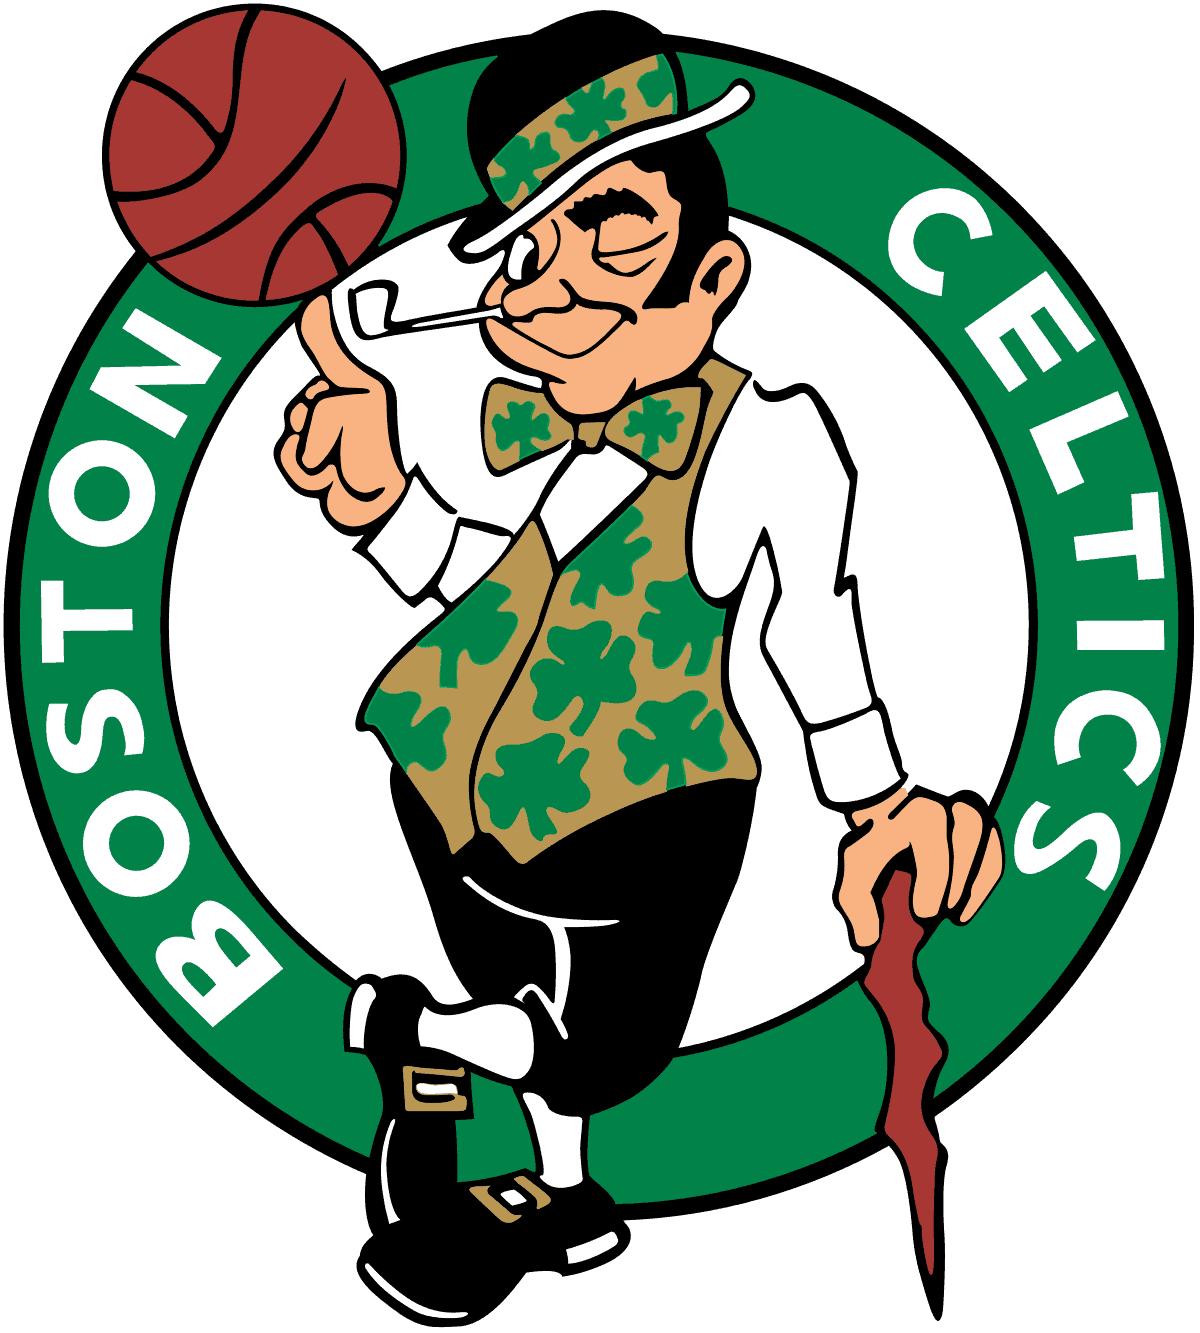 Boston Celtics case study